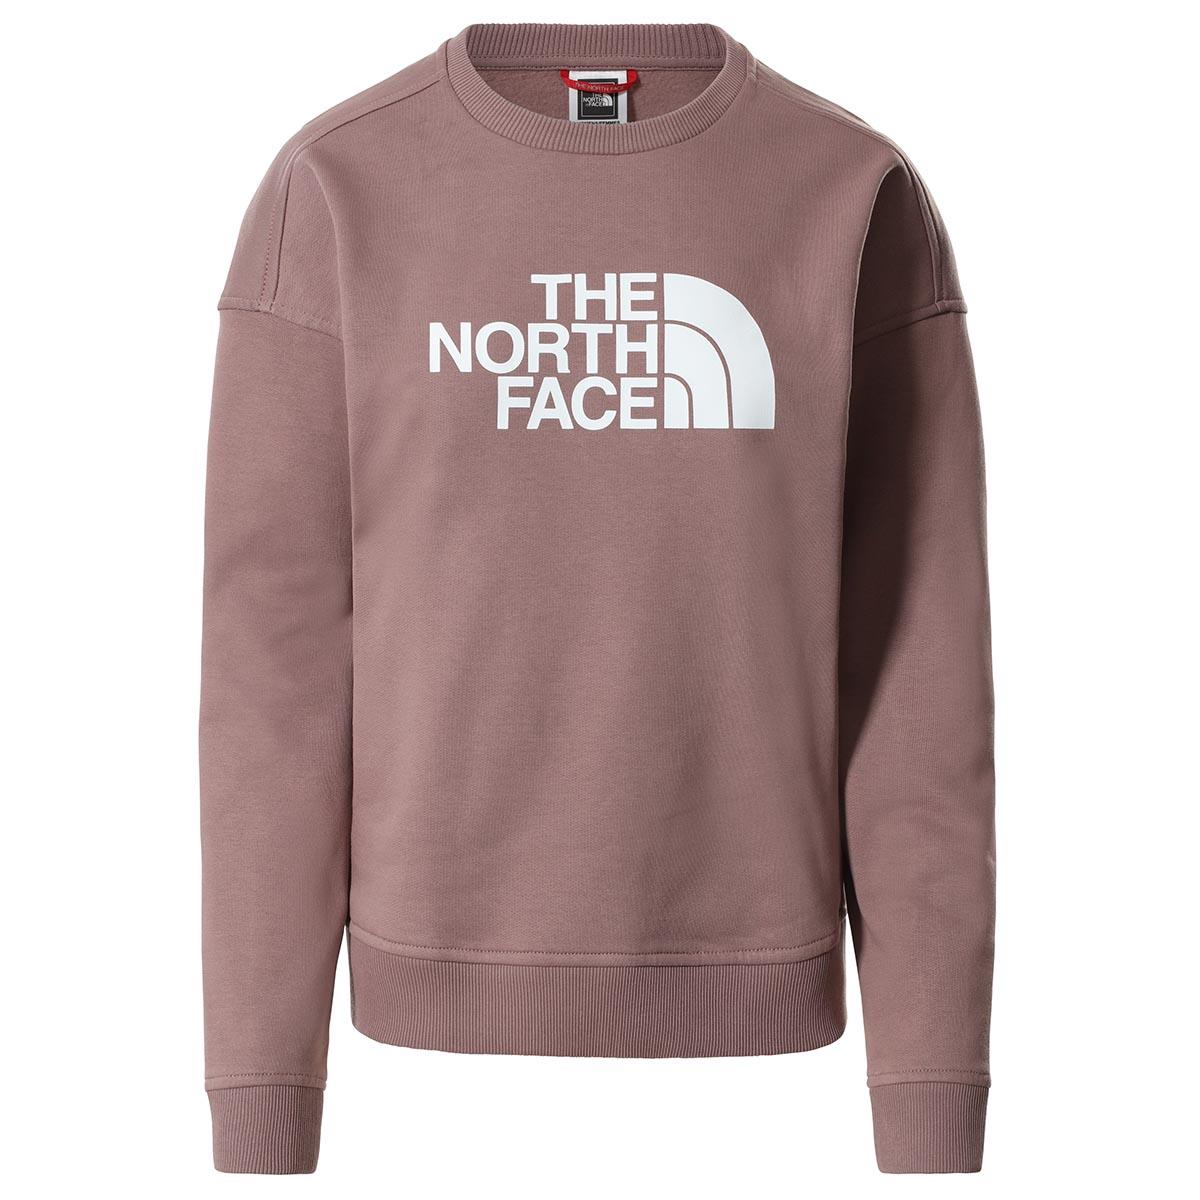 The Northface Kadın  DREW PEAK CREW-E NF0A3S4G0TA1